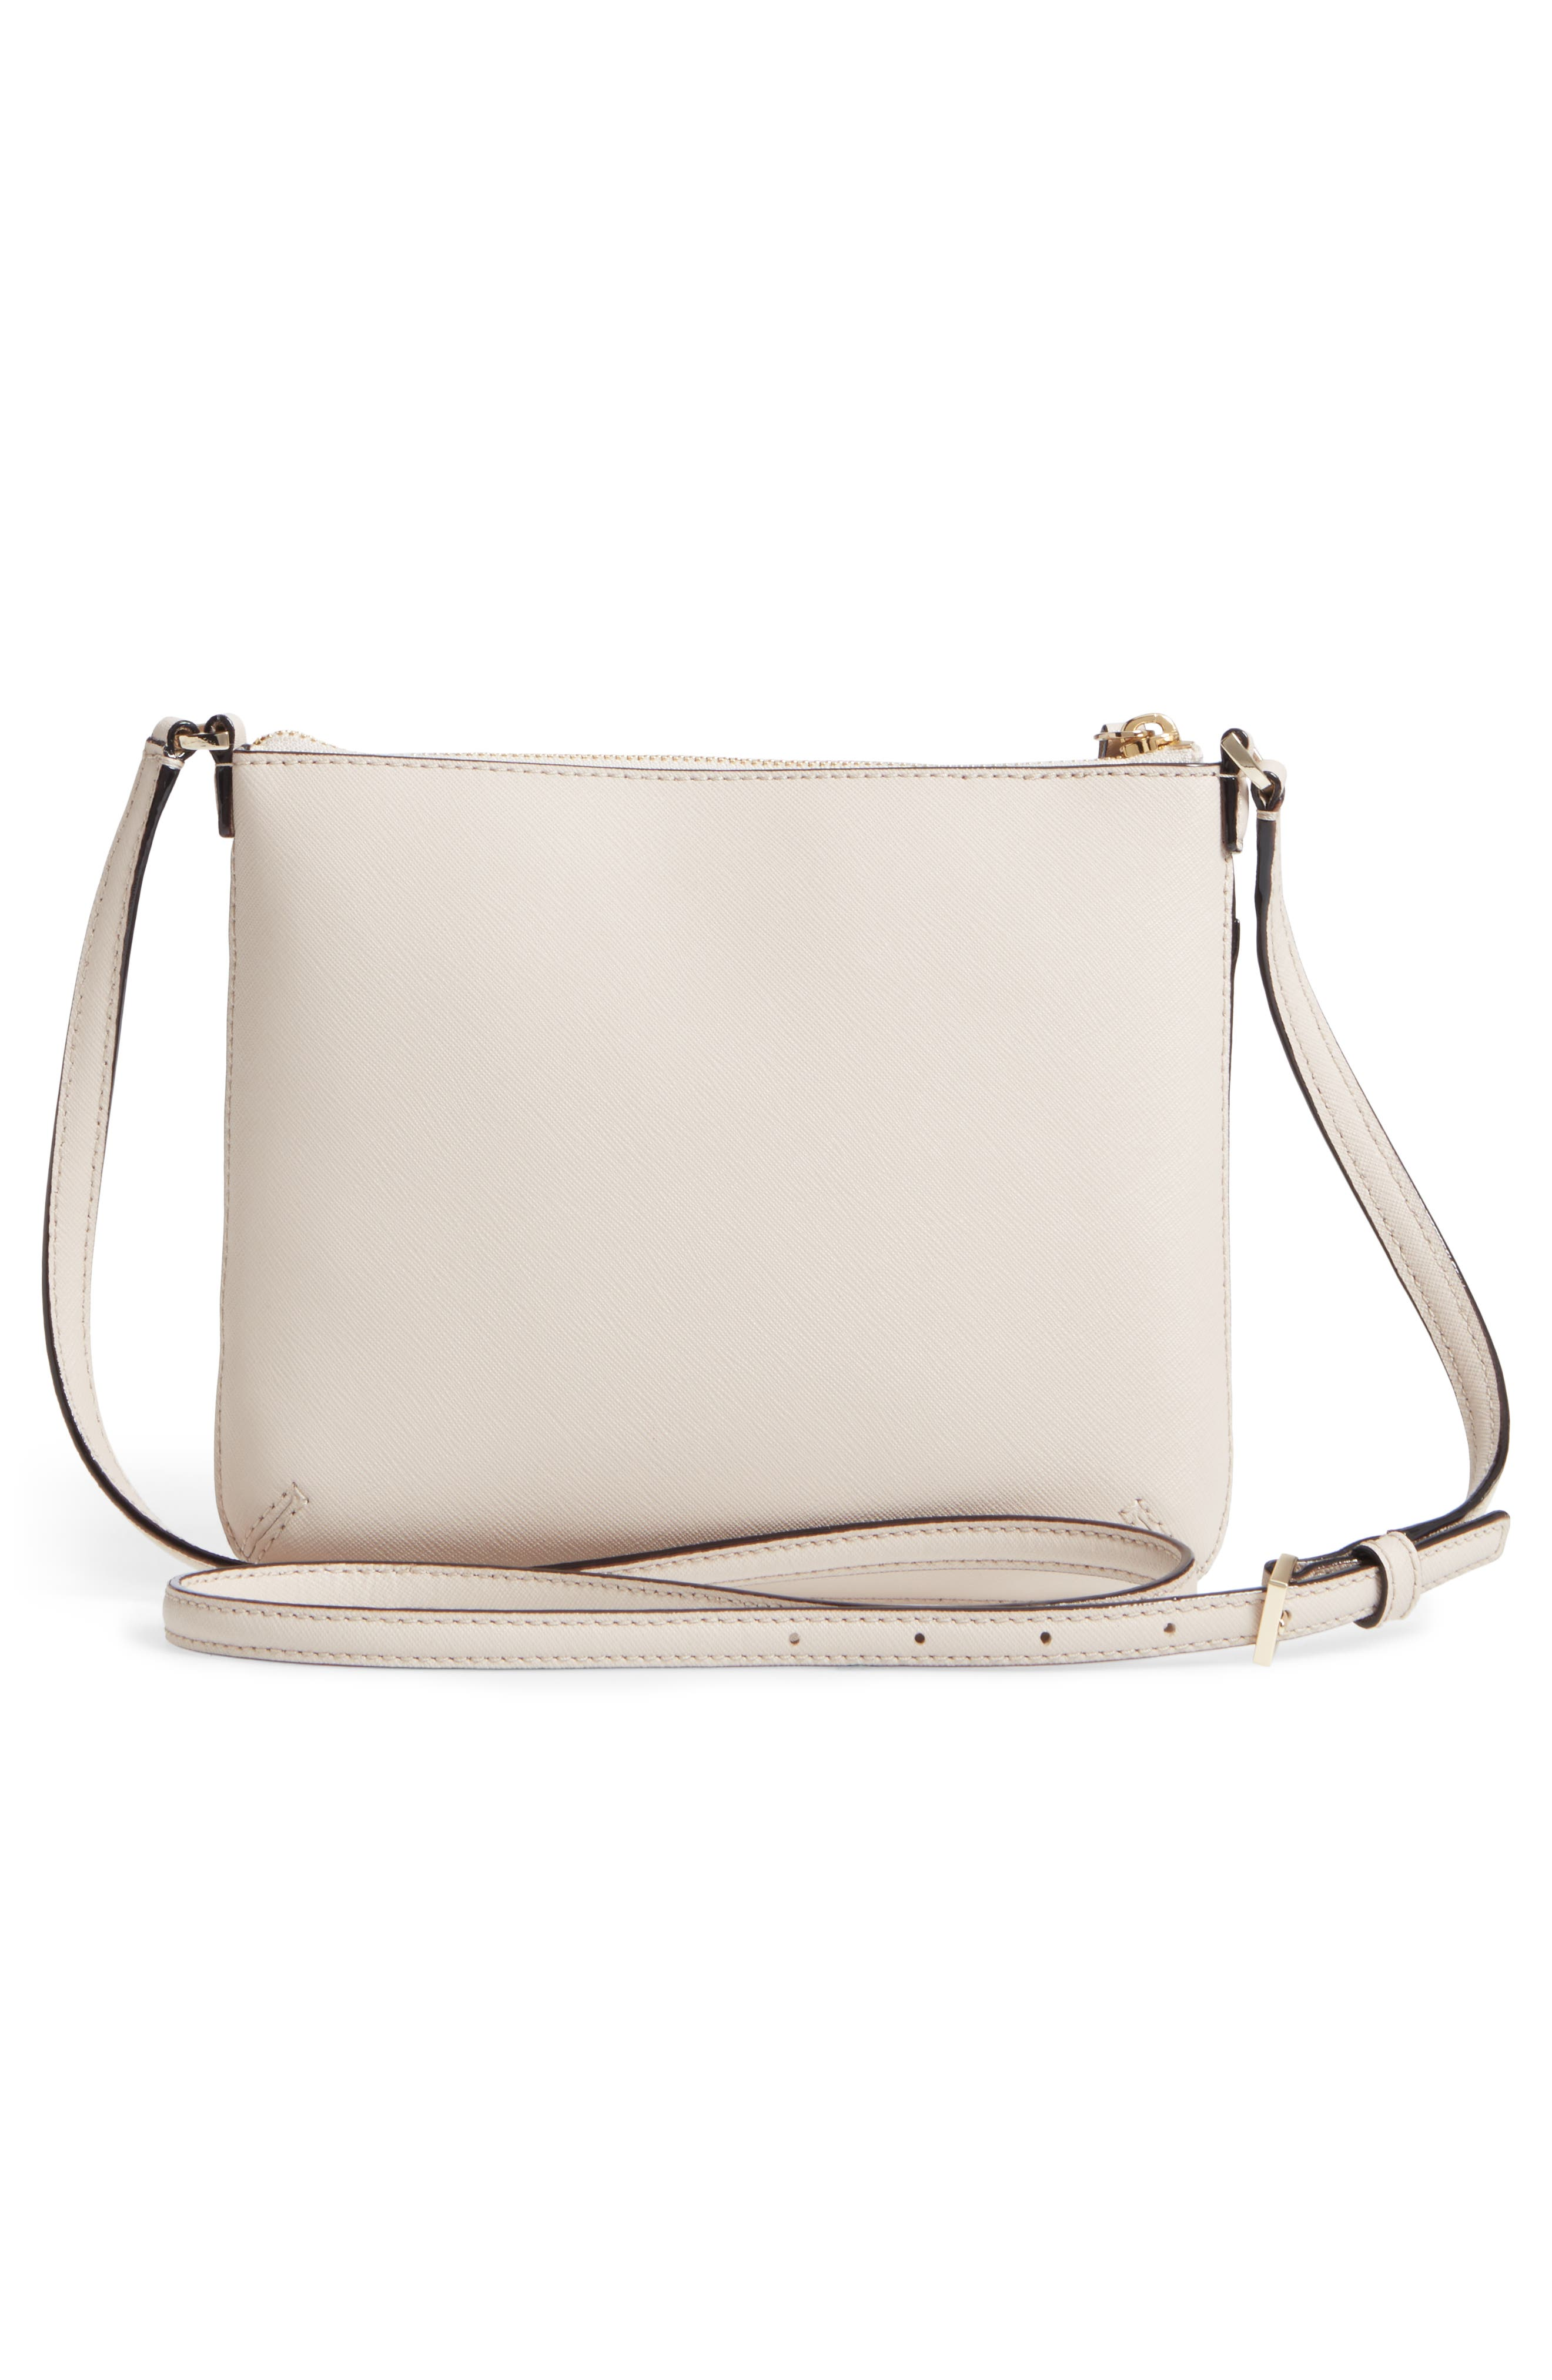 cameron street - tenley leather crossbody bag,                             Alternate thumbnail 3, color,                             Tusk